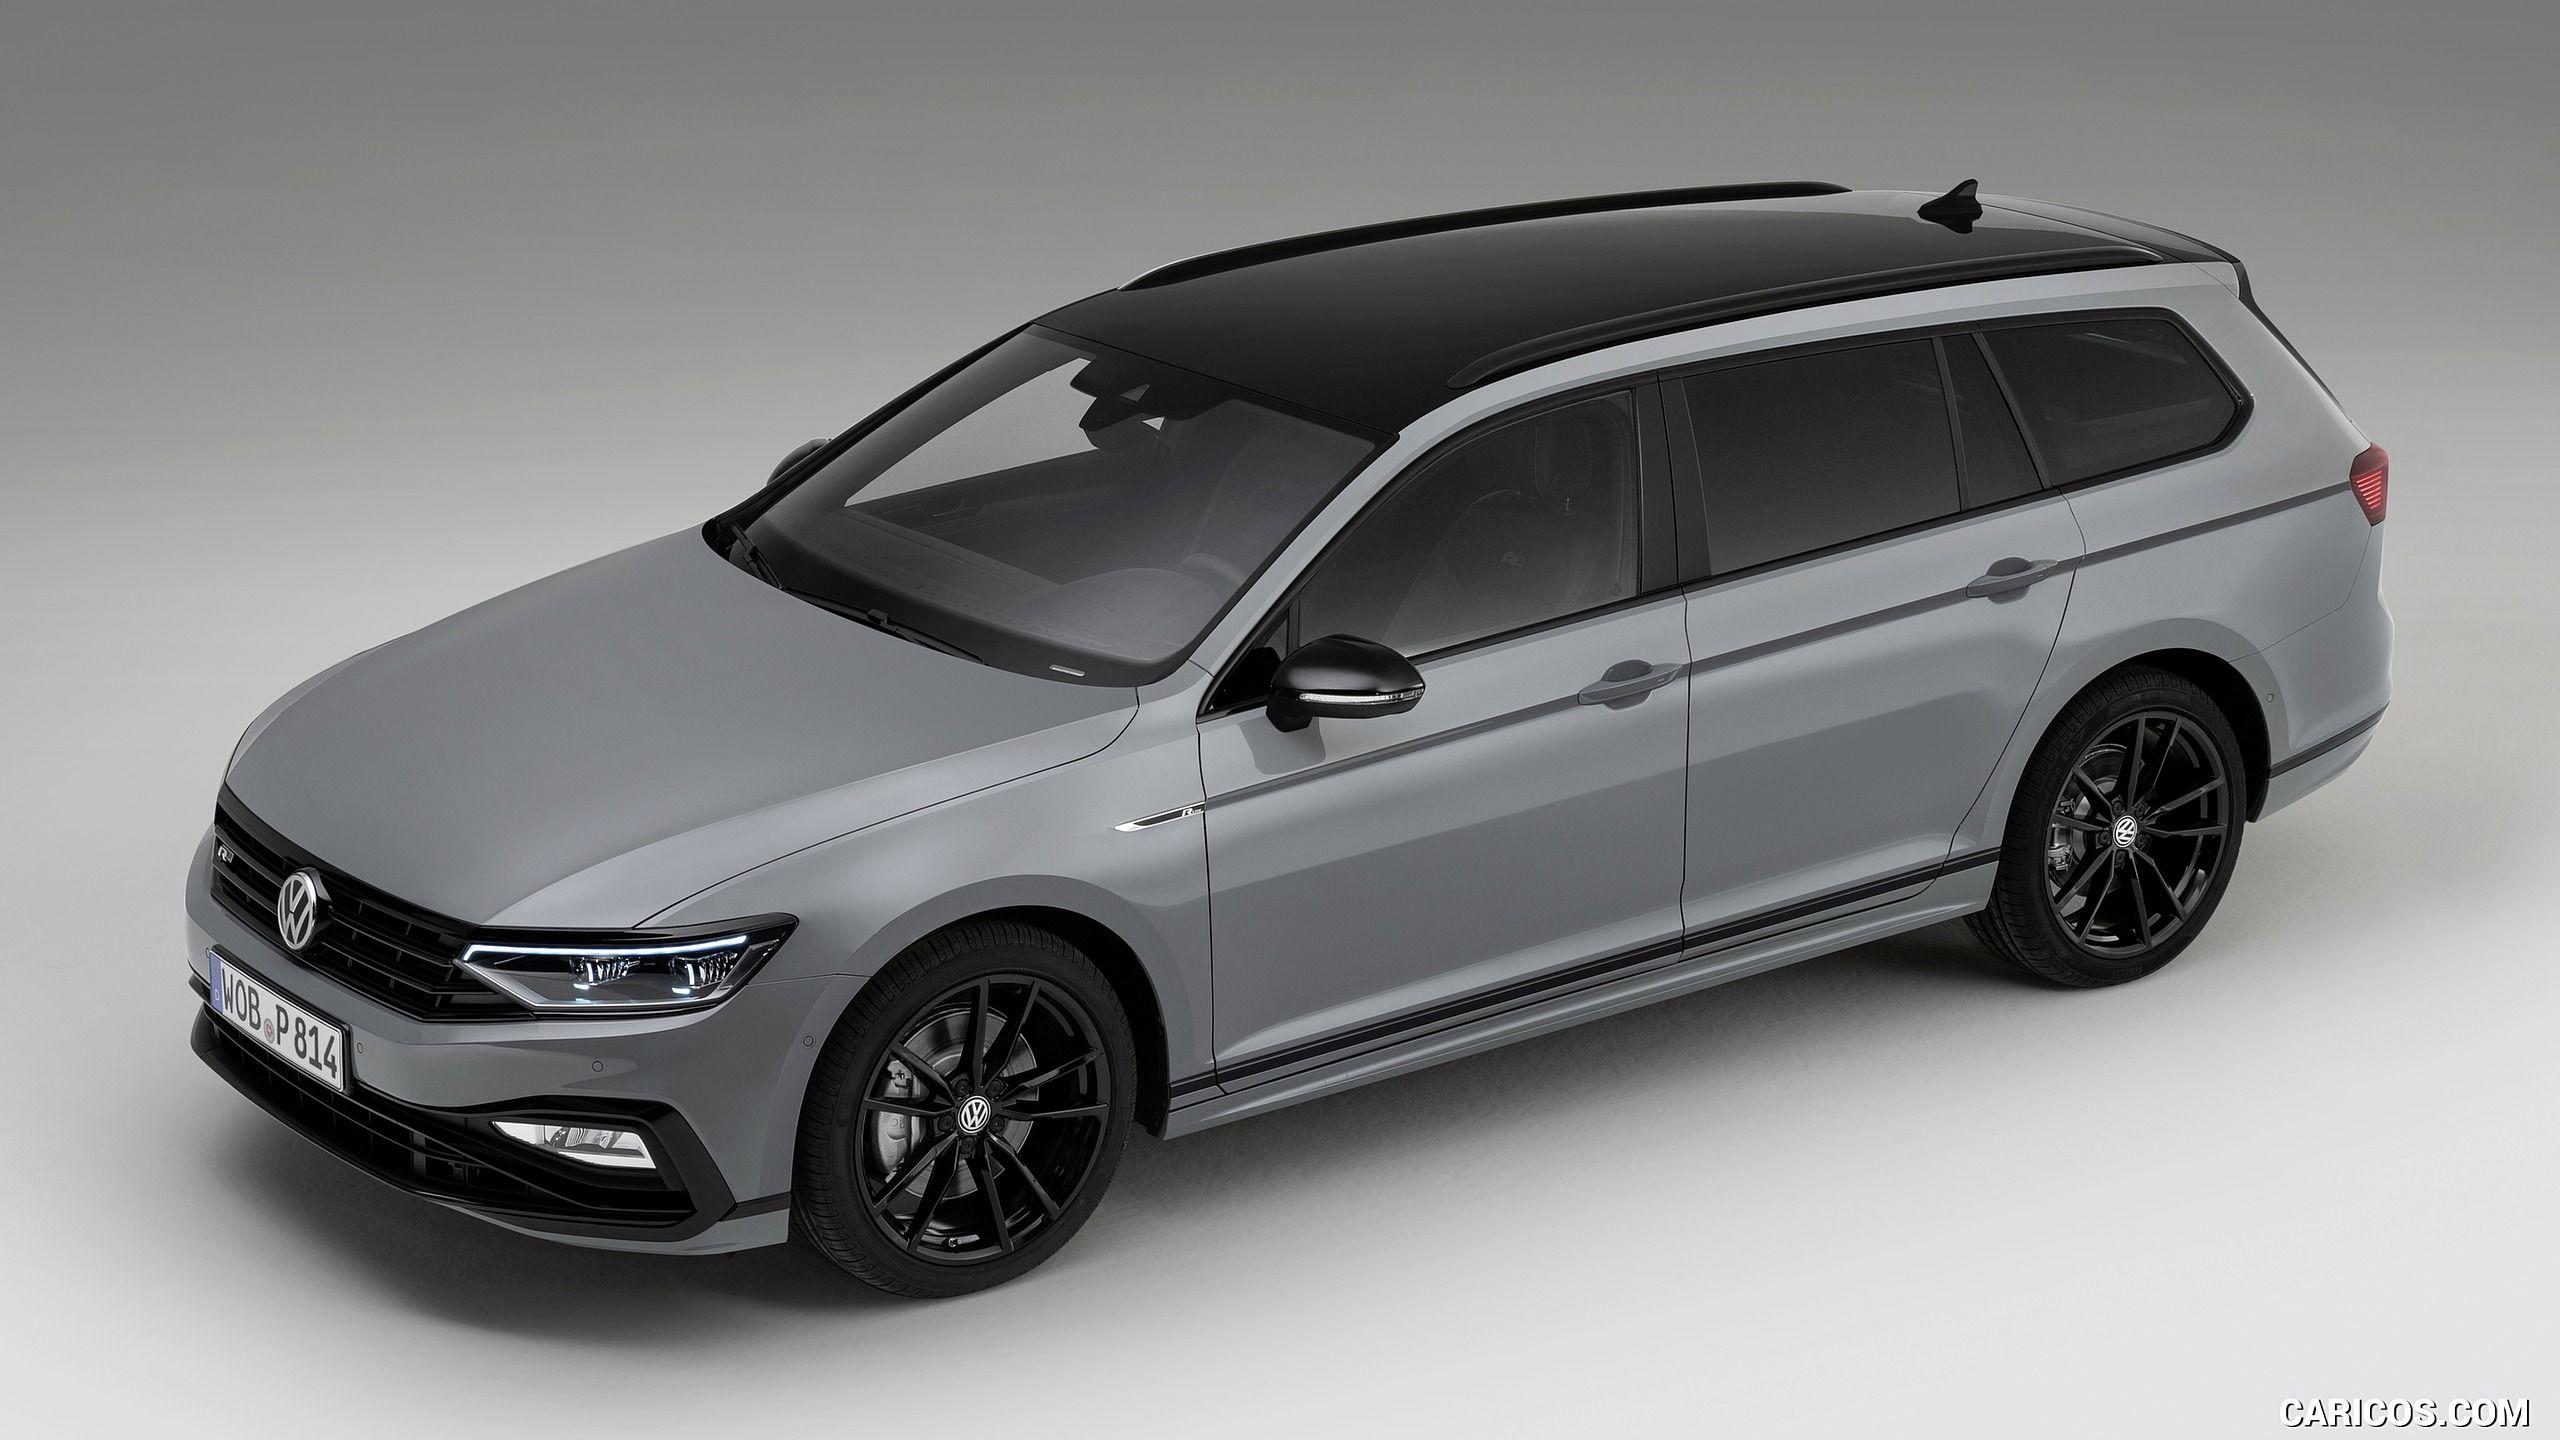 2019 Volkswagen Passat Variant R Line Edition Eu Spec Front Three Quarter Hd Vw Passat Variant Passat Alltrack Kompakt Suv